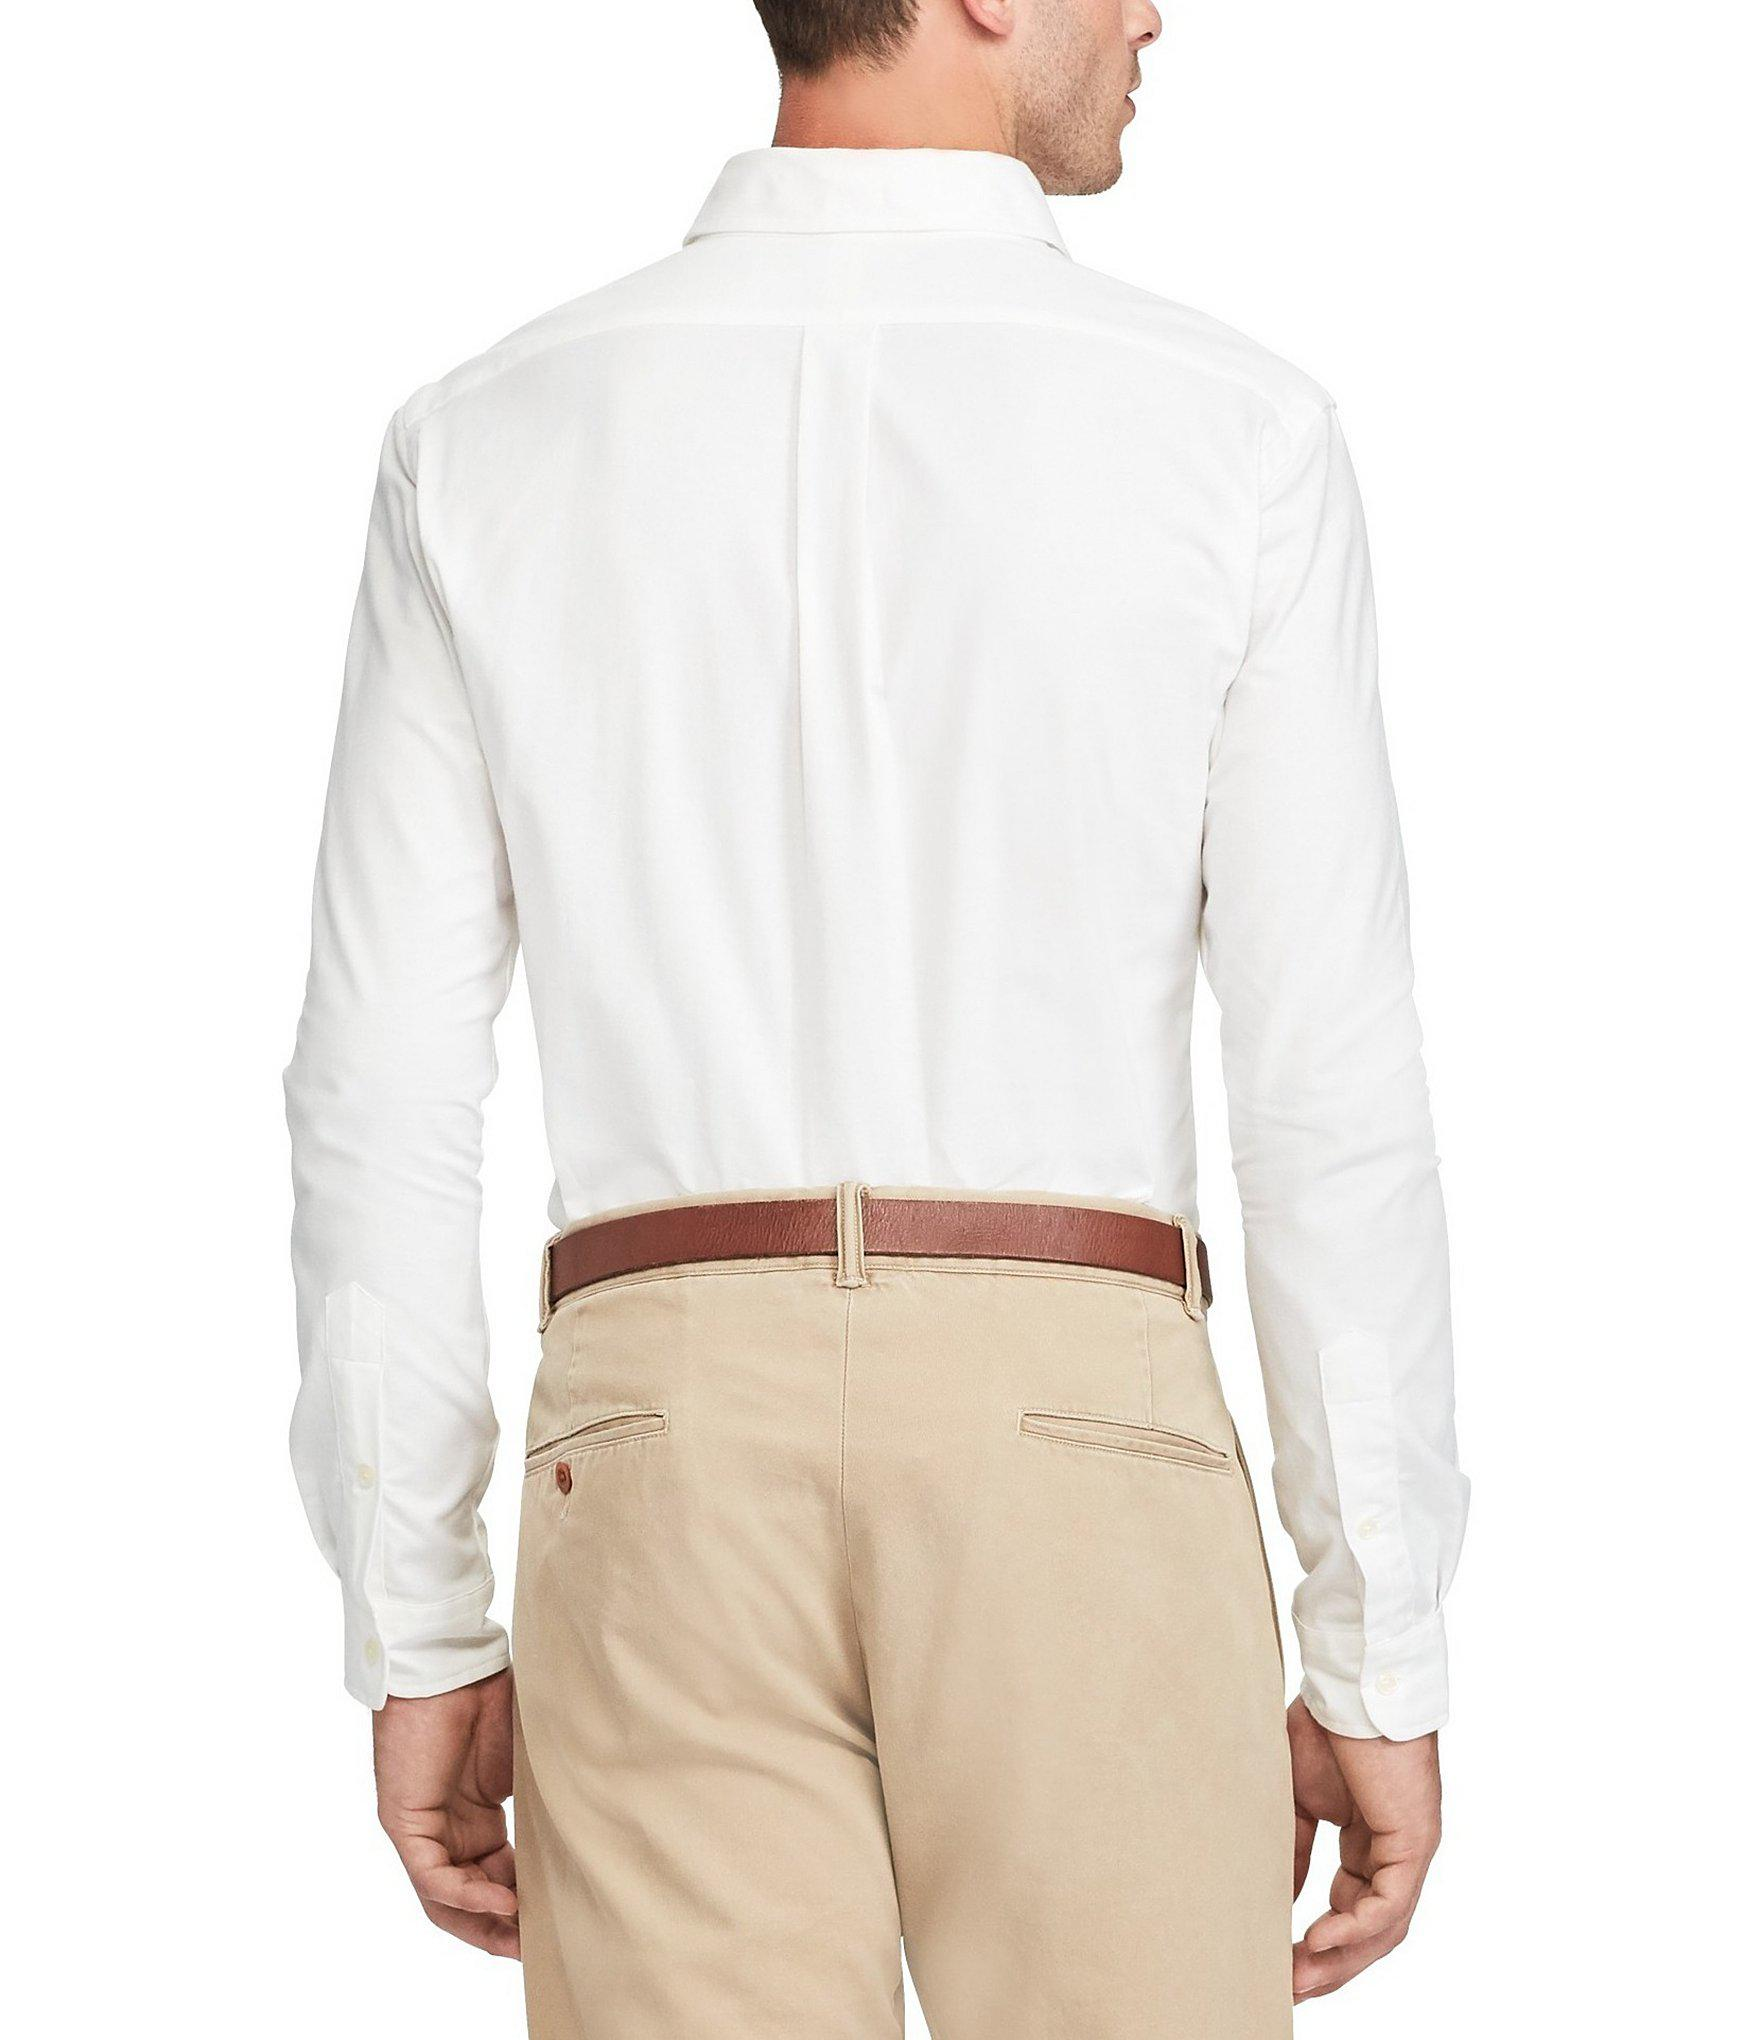 ebfe2765 Polo Ralph Lauren - Blue Slim-fit Solid Stretch Oxford Long-sleeve Woven  Shirt. View fullscreen